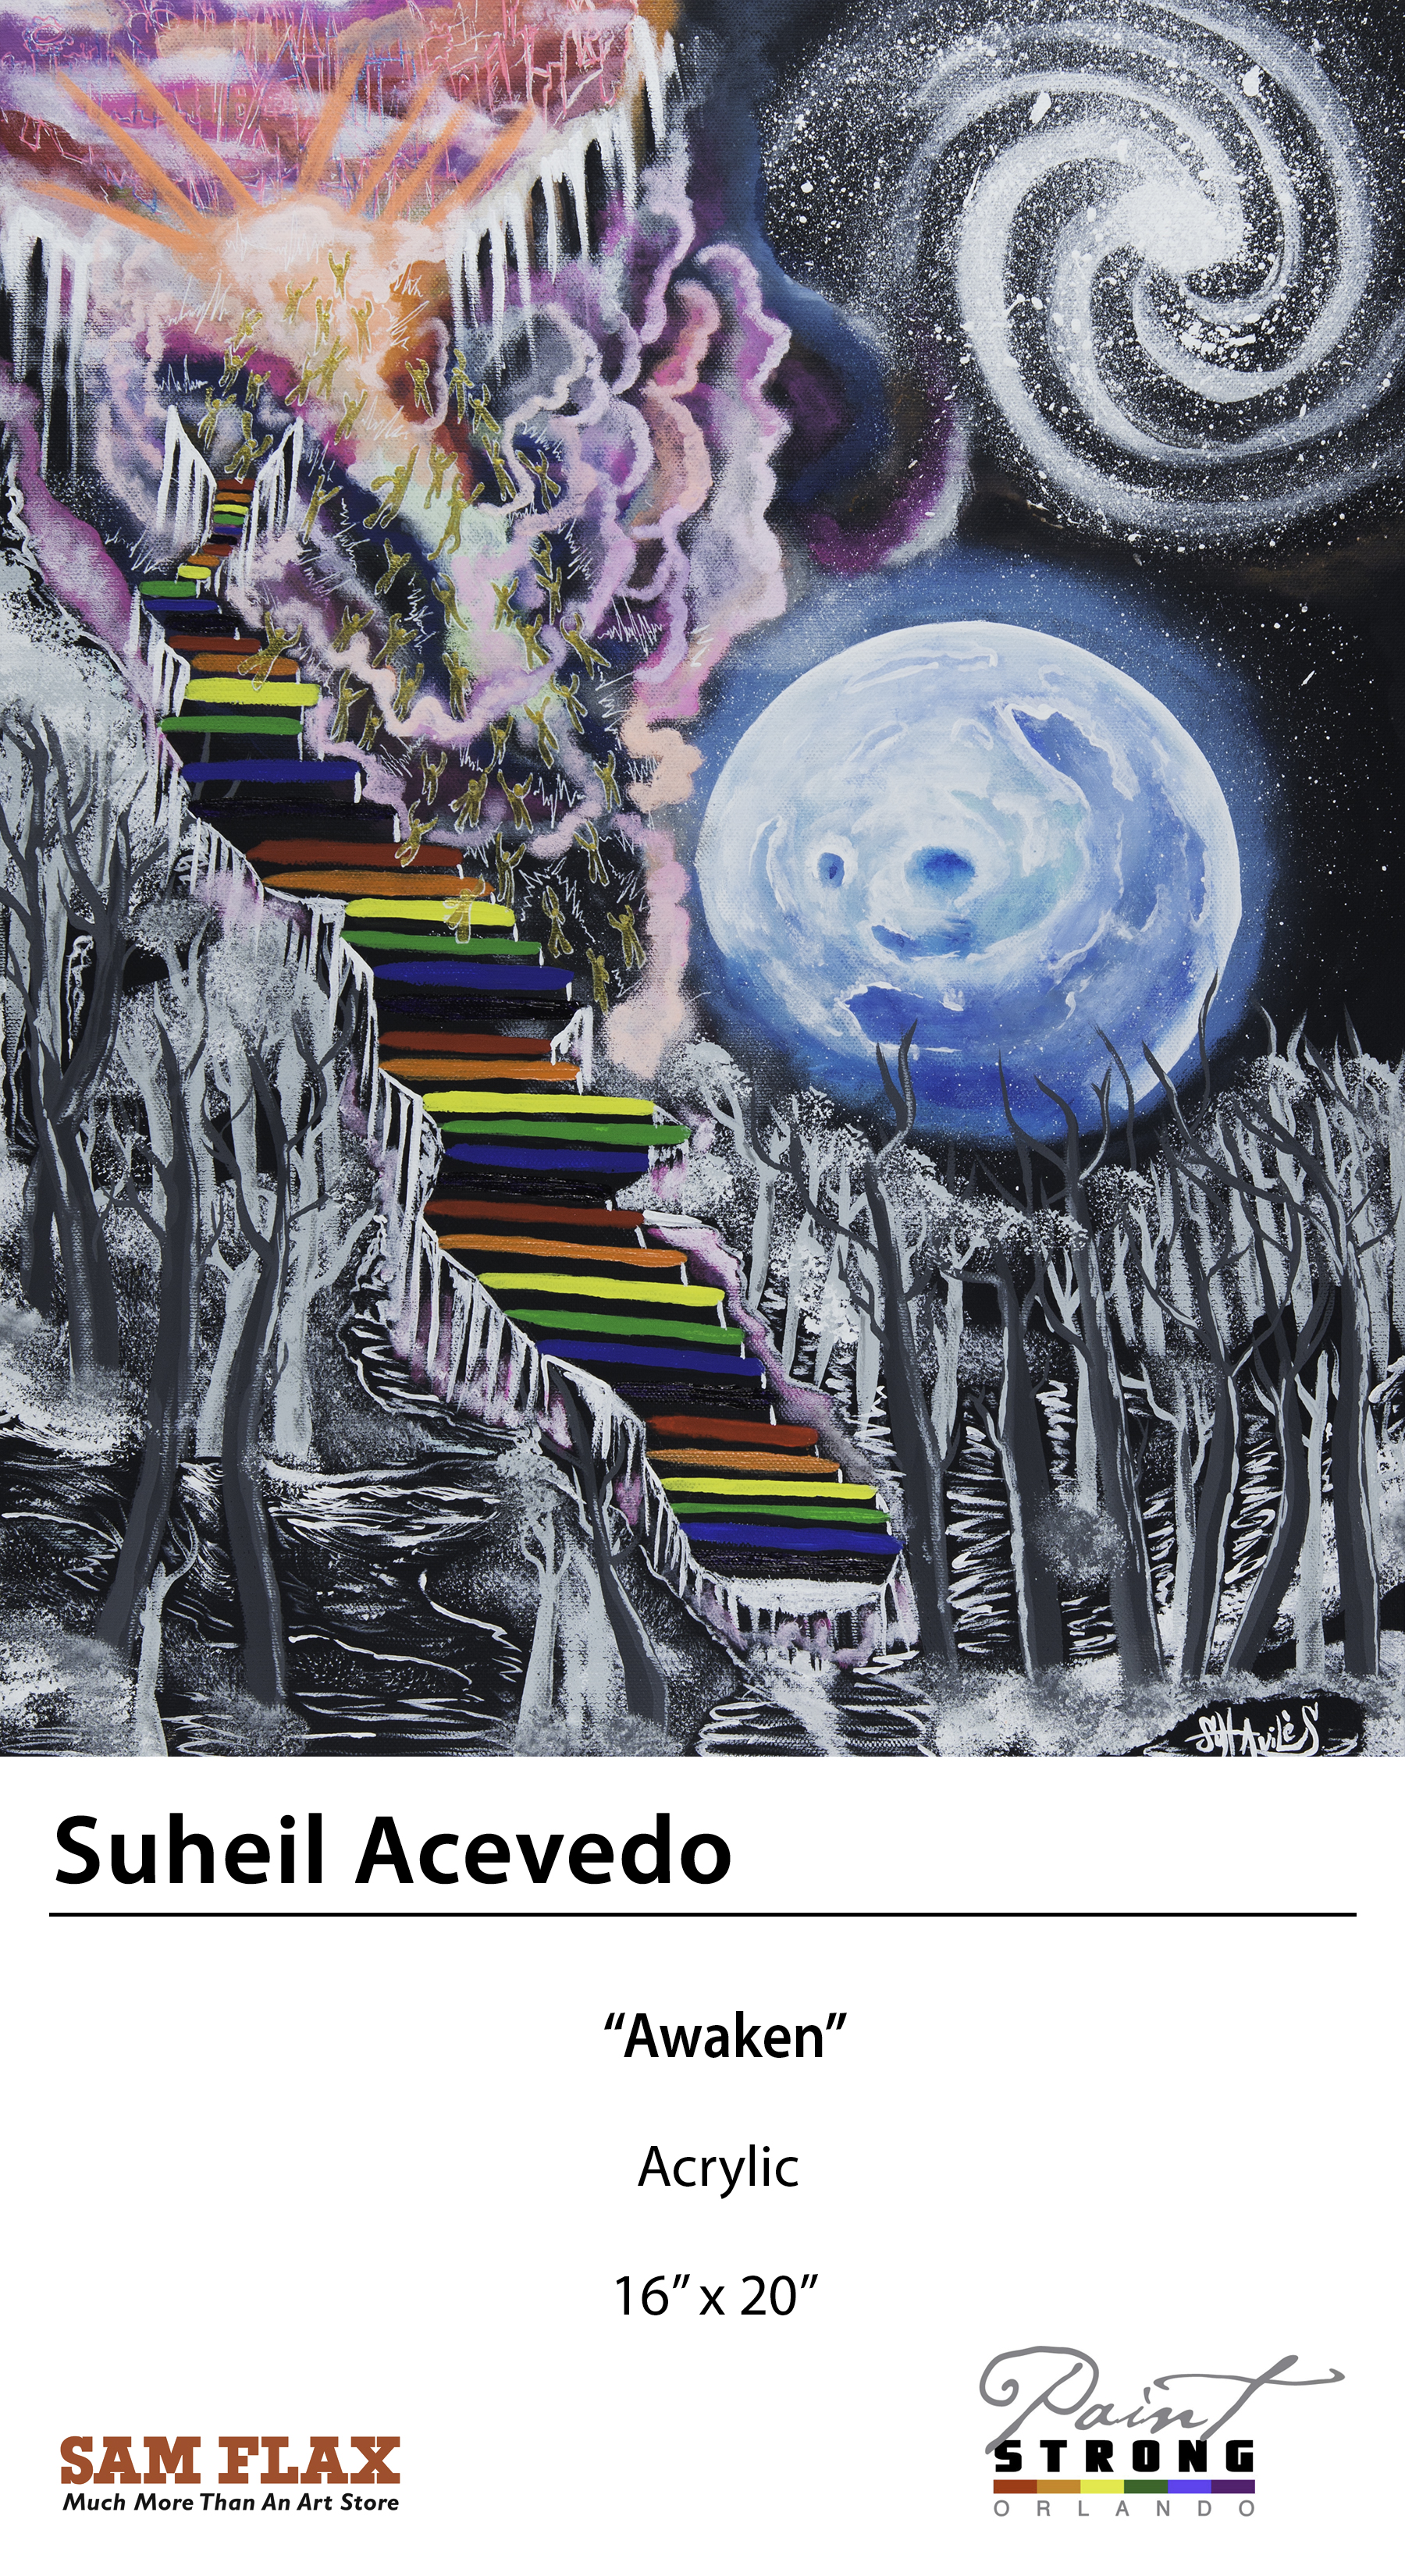 Suheil Acevedo